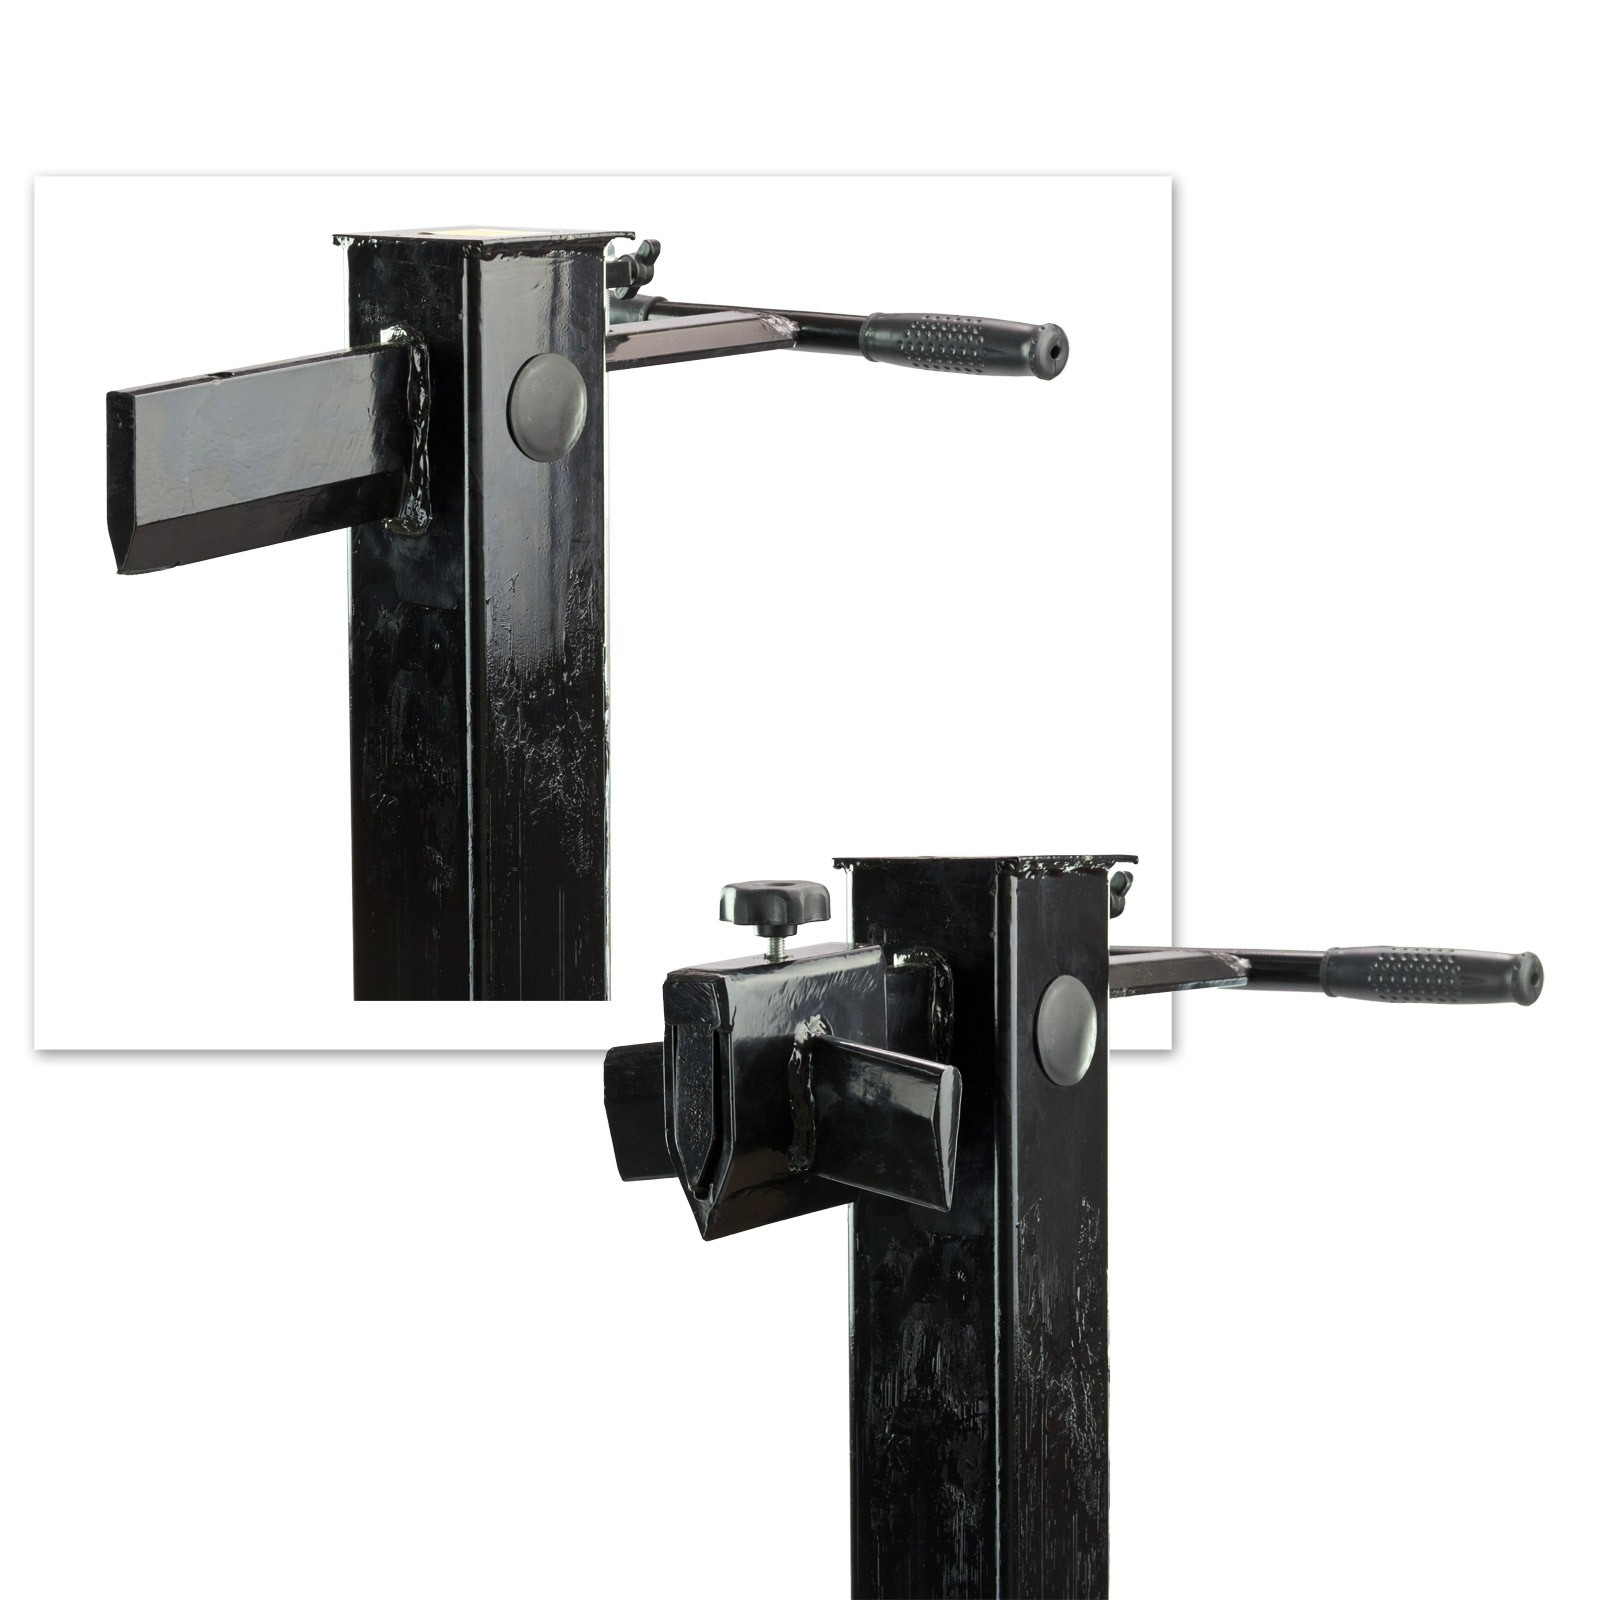 holzspalter brennholzspalter 6 tonnen 230v mit spaltkreuz. Black Bedroom Furniture Sets. Home Design Ideas